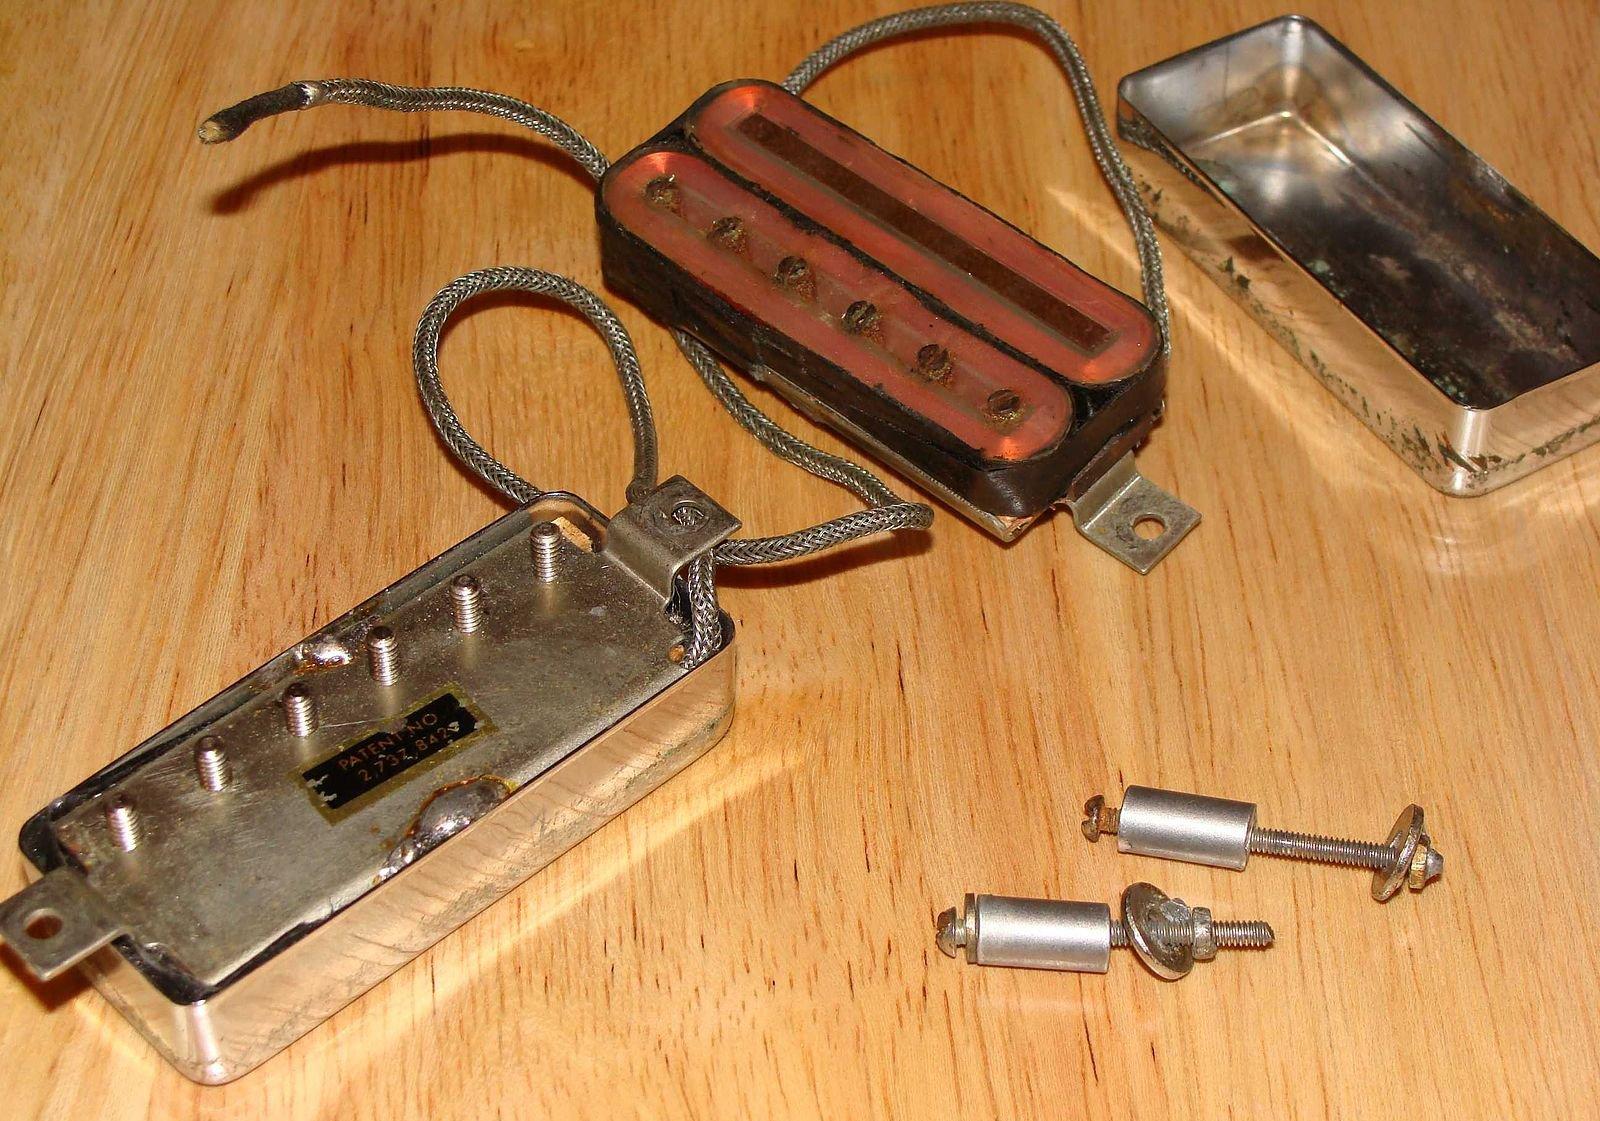 Gibson Les Paul Deluxe Mini-Humbuckers (Patent No. 2,737,842)